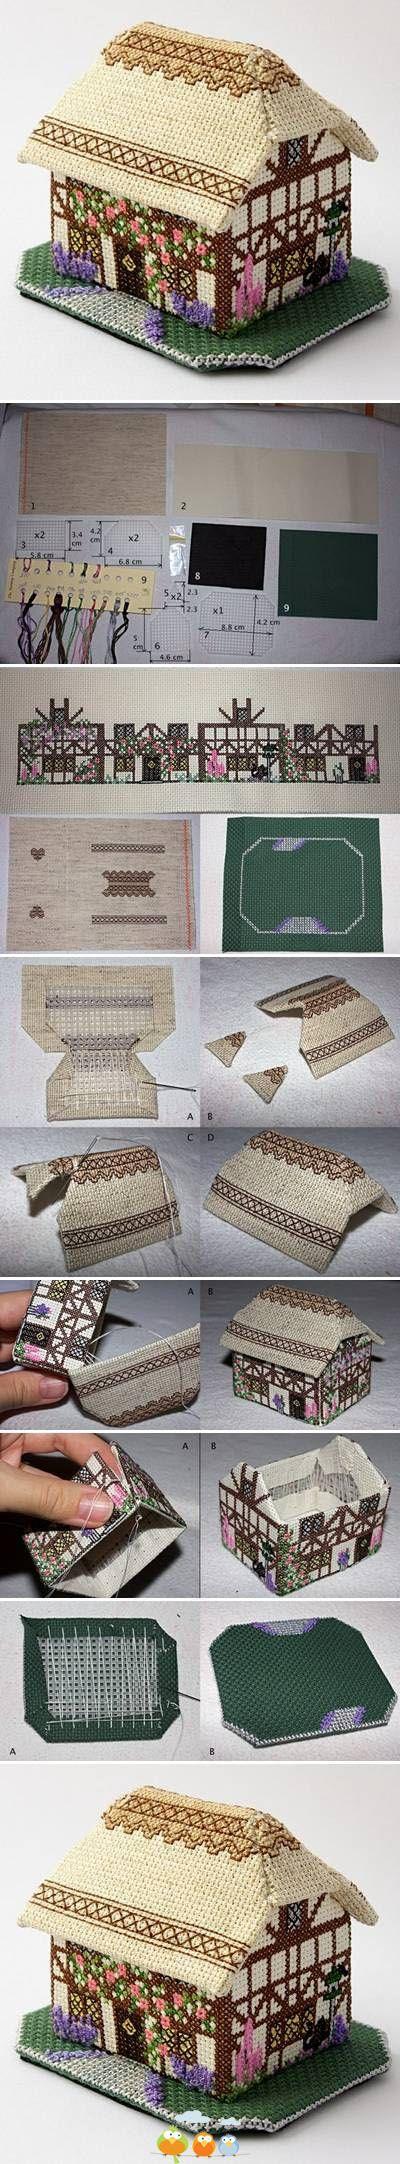 needlework 3-D house PRECIOSIDAD